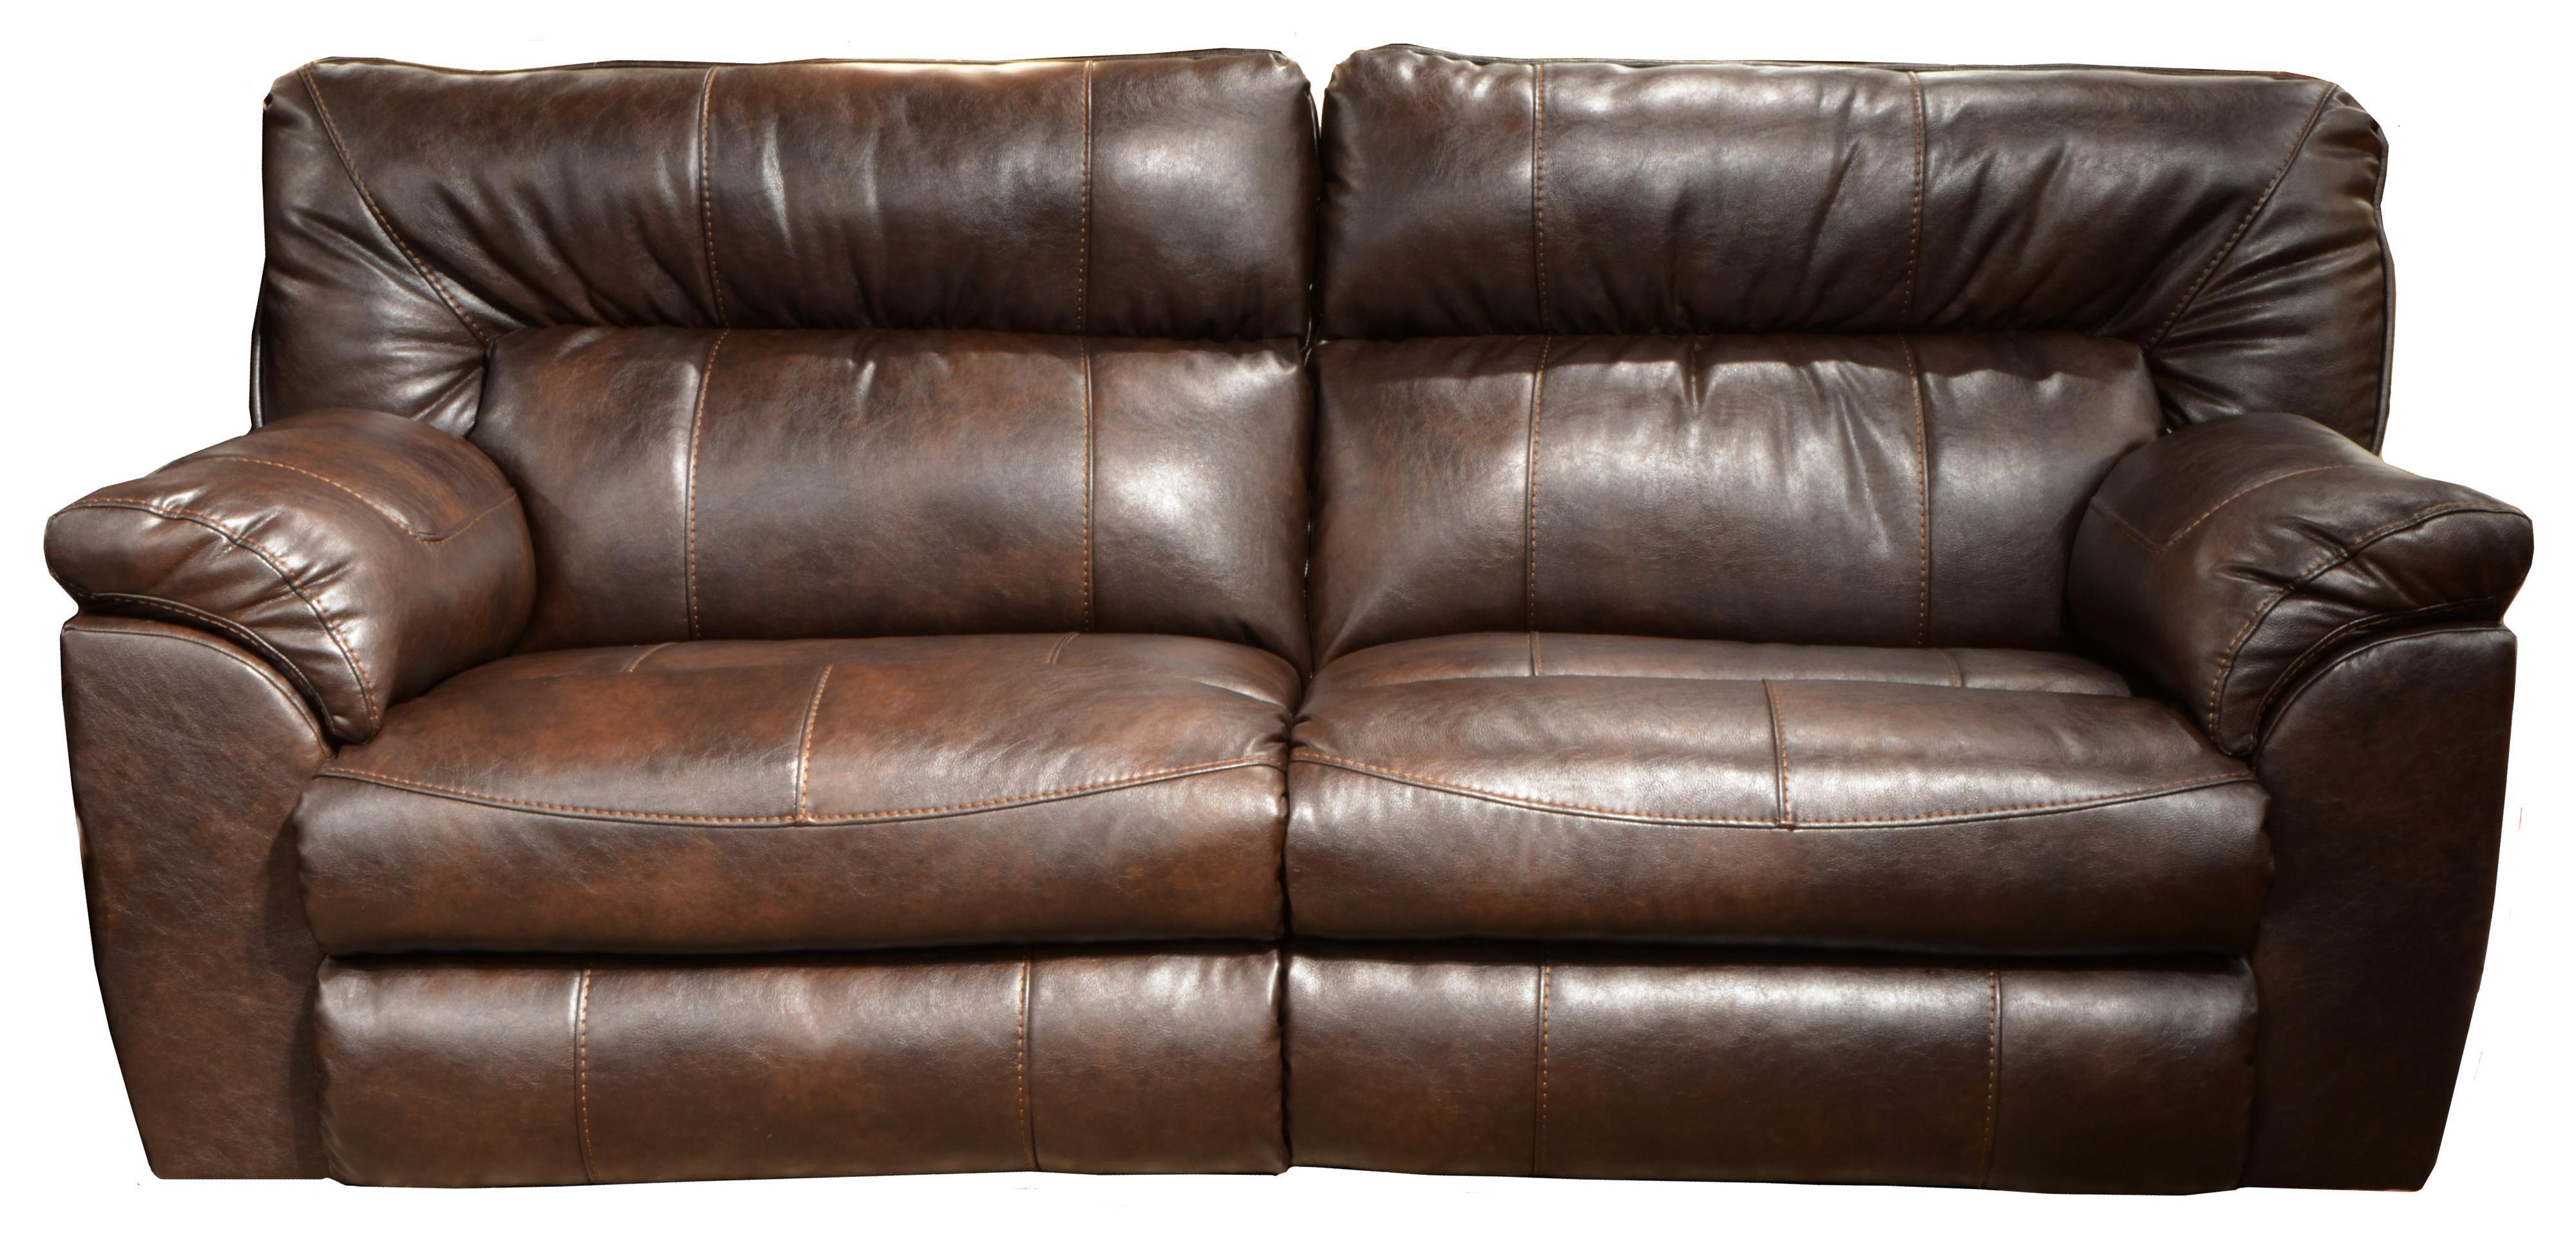 Catnapper Maverick Extra Wide Reclining Sofa – Efo Furniture Inside Catnapper Recliner Sofas (View 2 of 20)